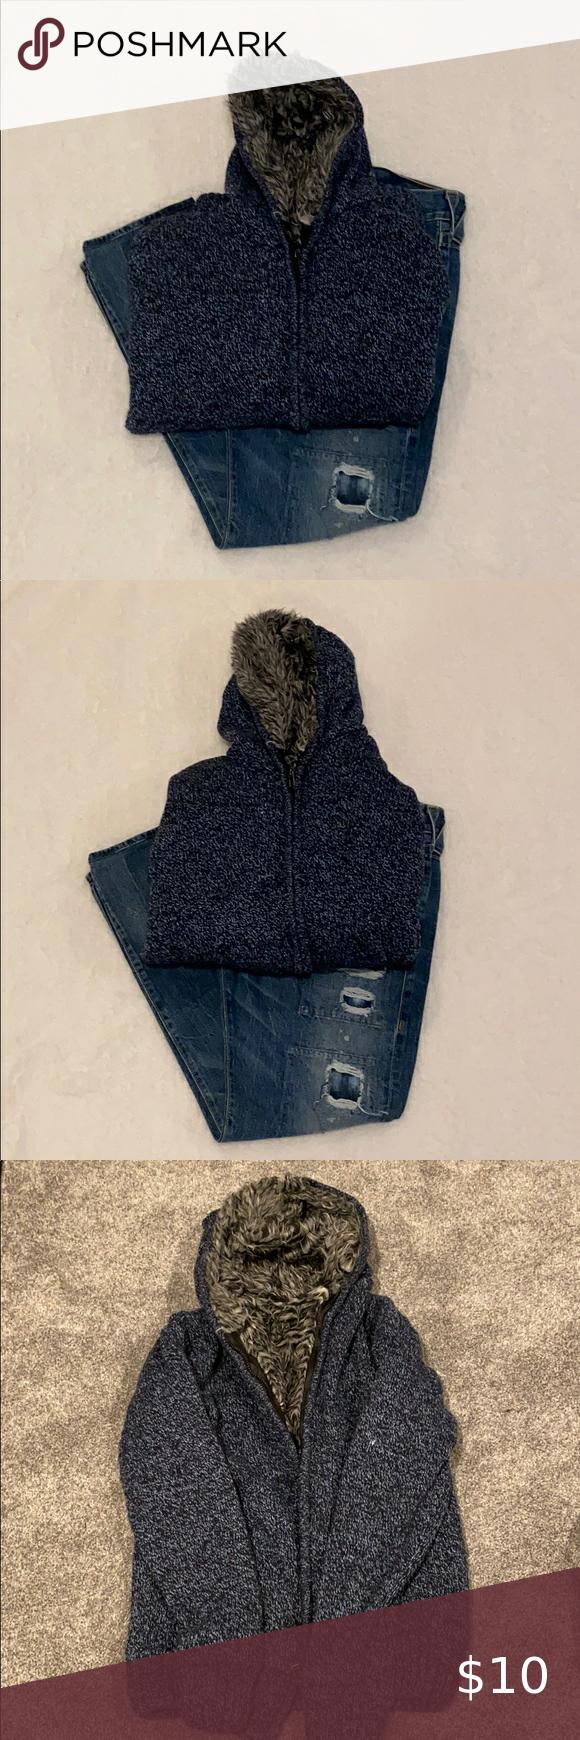 Men wool sweater zip up jacket size M